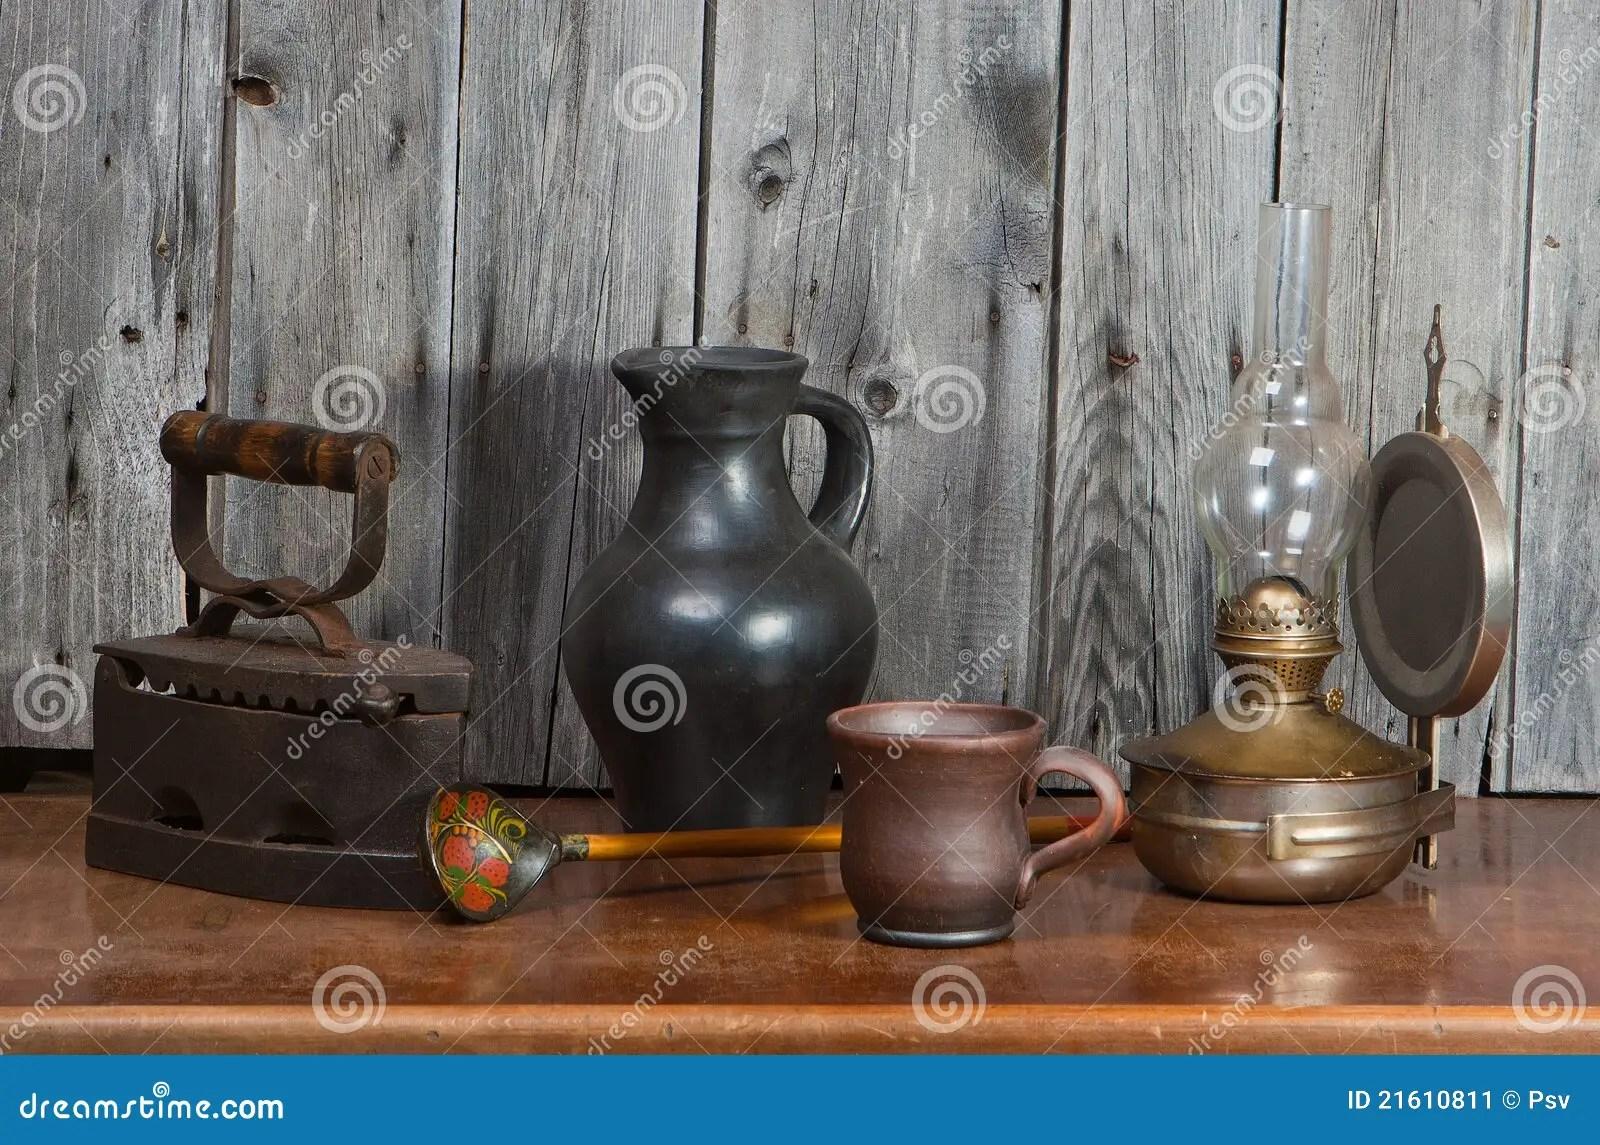 Alte Sachen stockbild. Bild von laterne, keramik